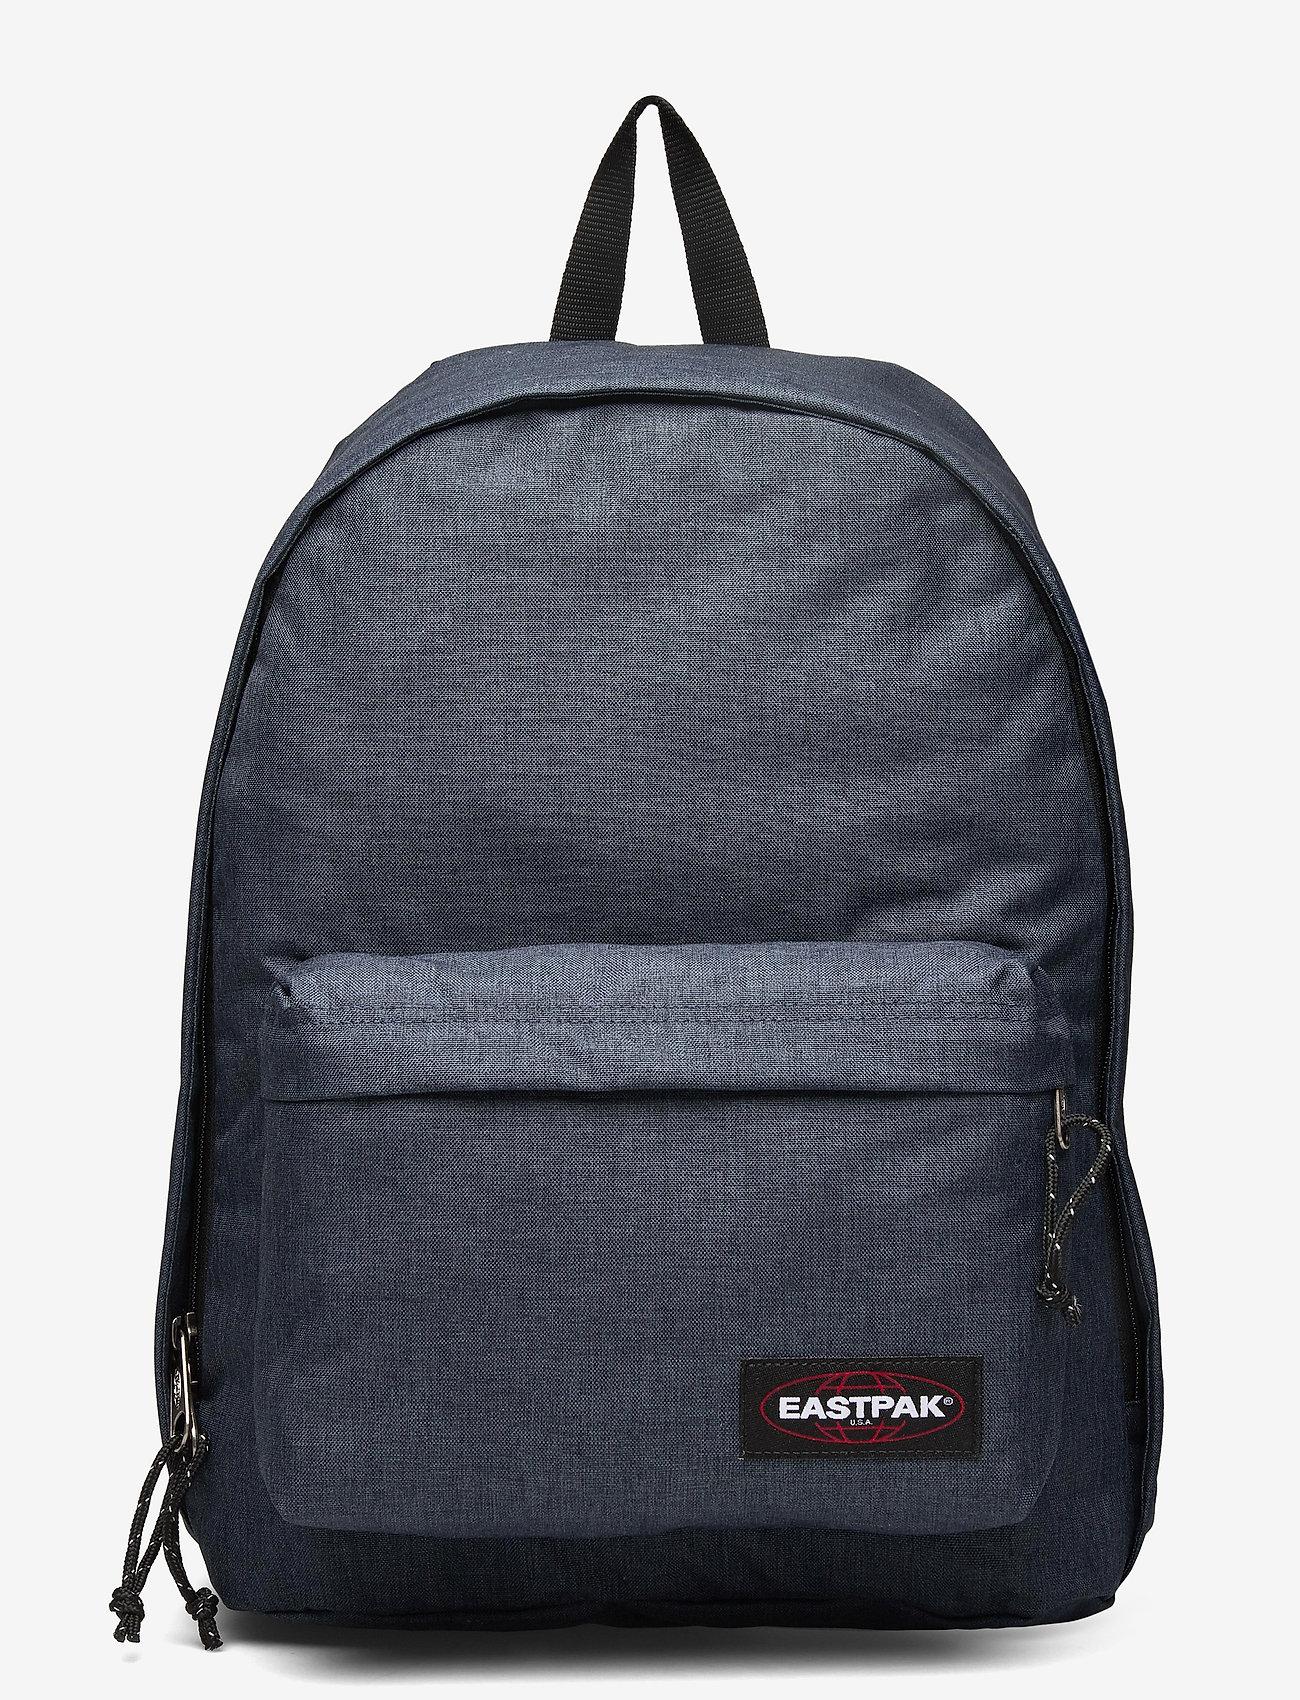 Eastpak - OUT OF OFFICE - rucksäcke - triple denim - 0